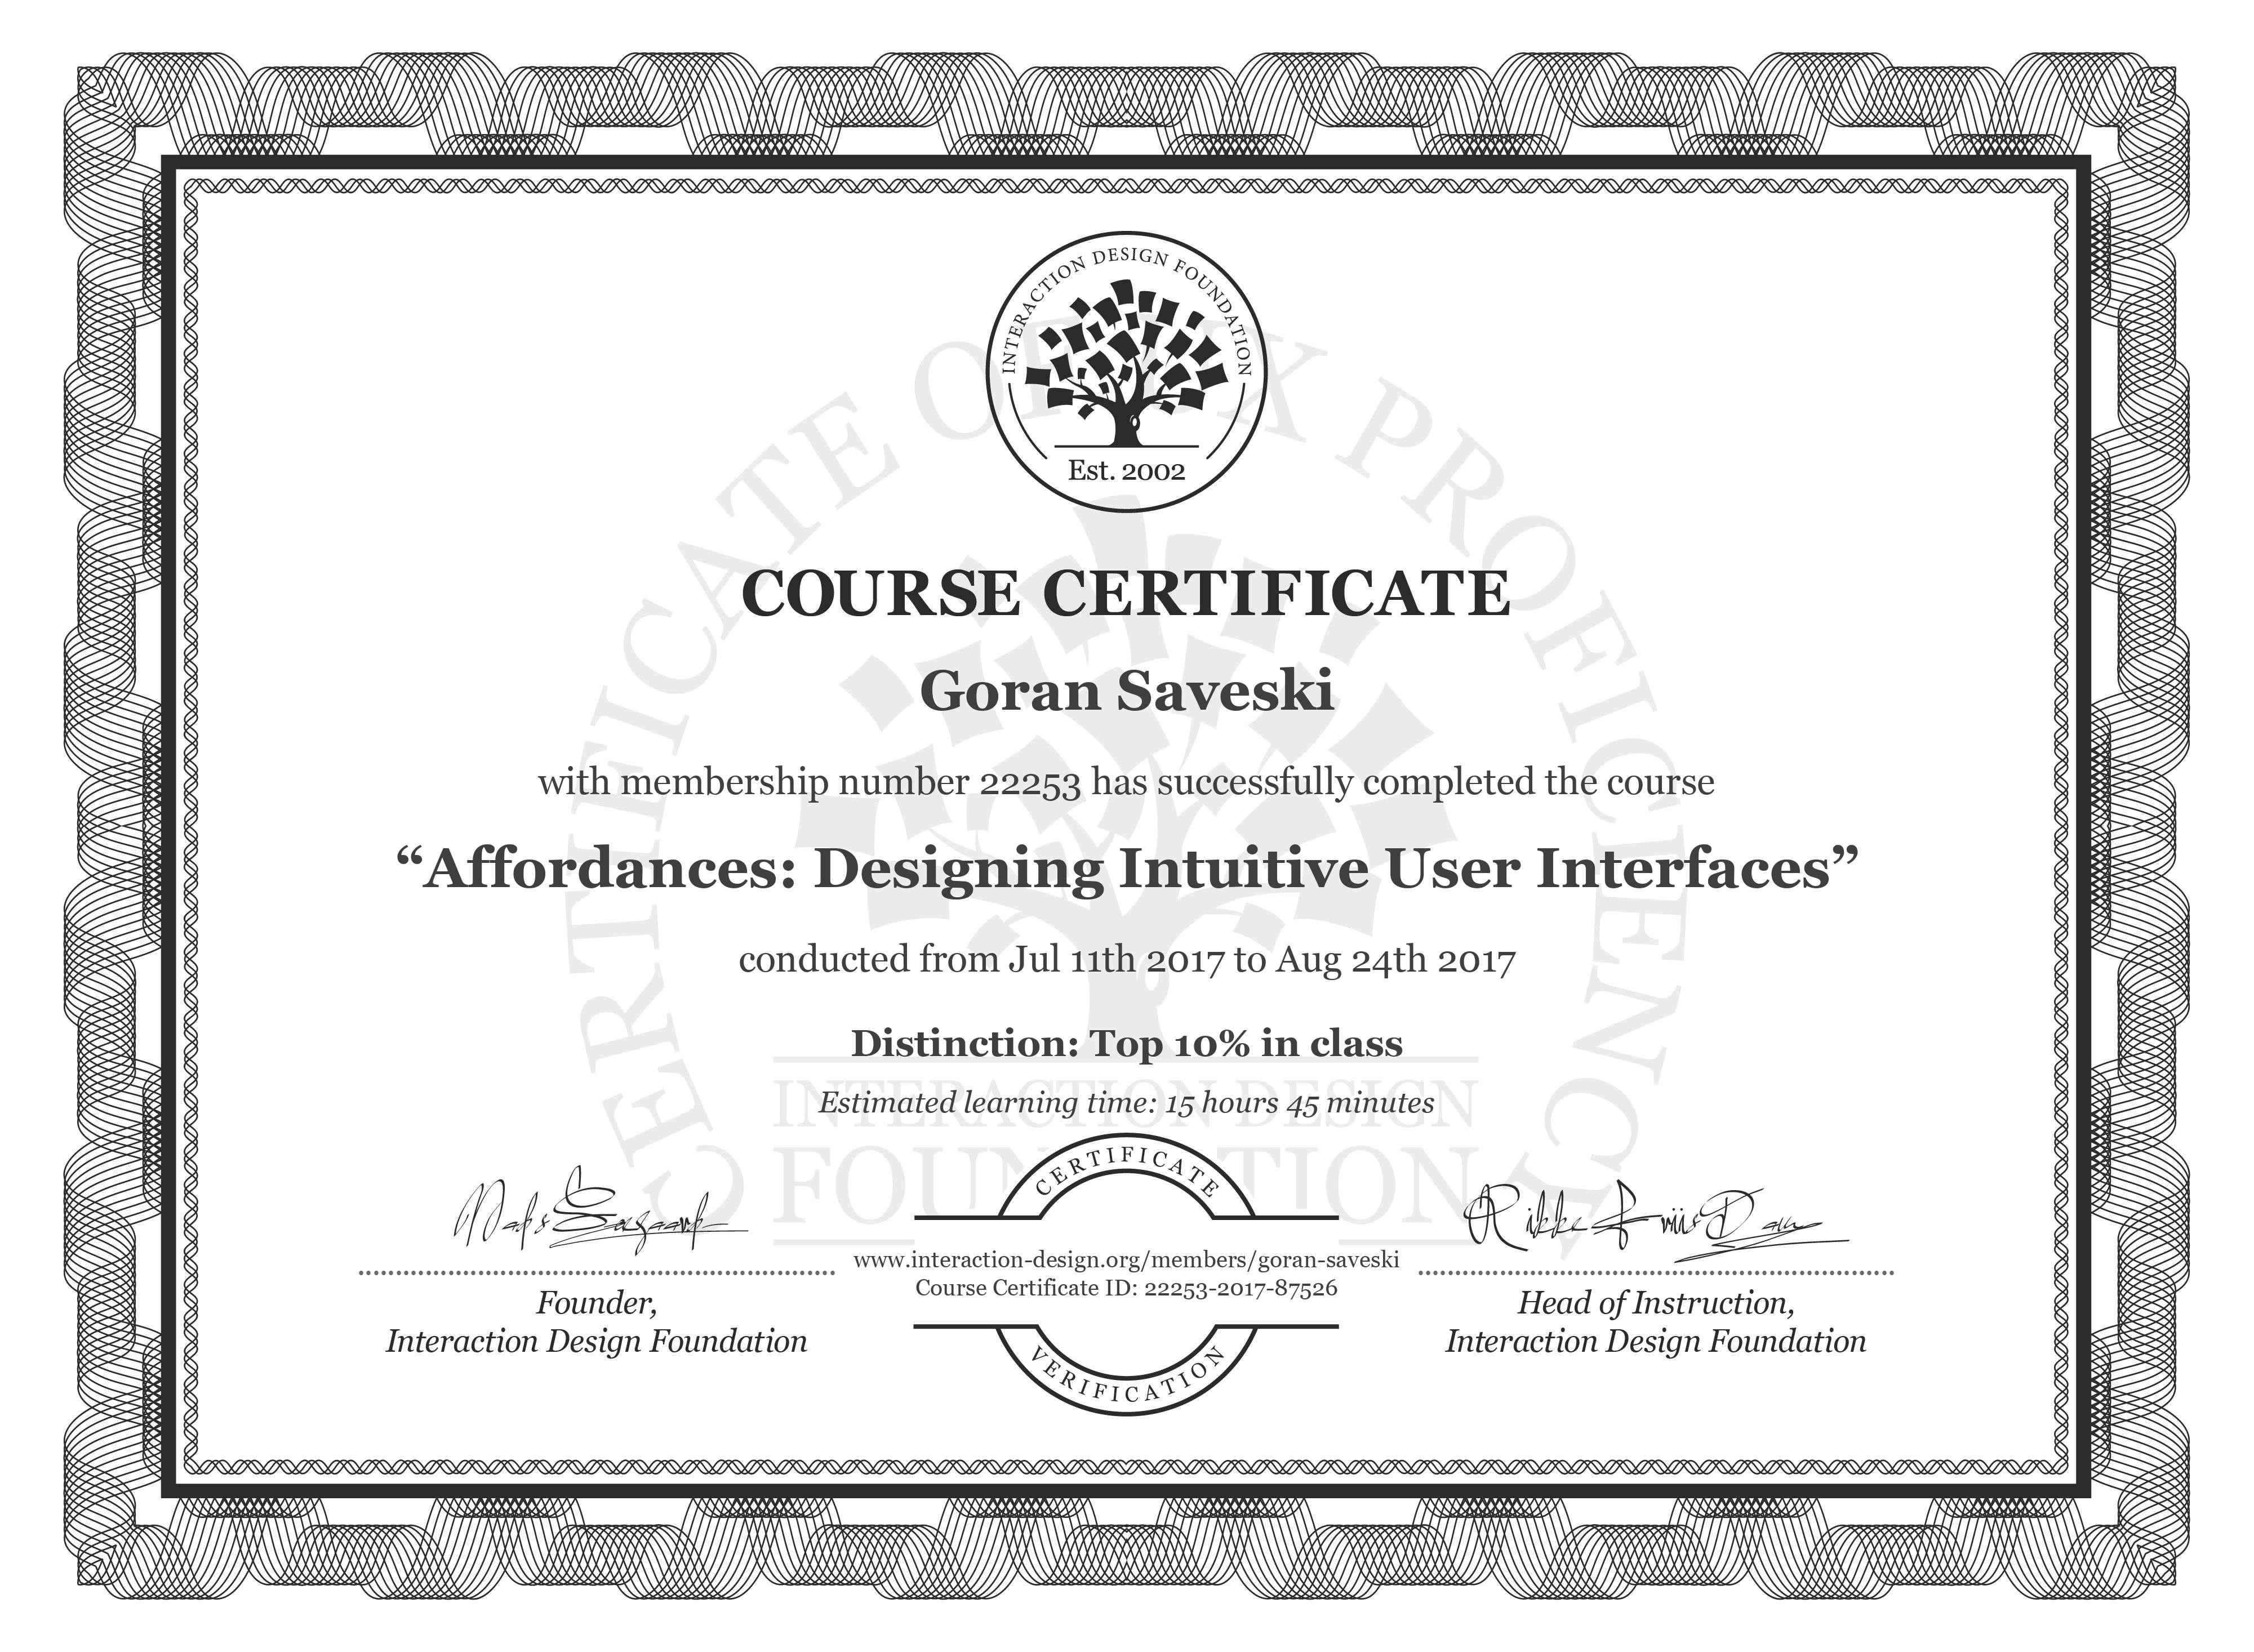 Goran Saveski: Course Certificate - Affordances: Designing Intuitive User Interfaces